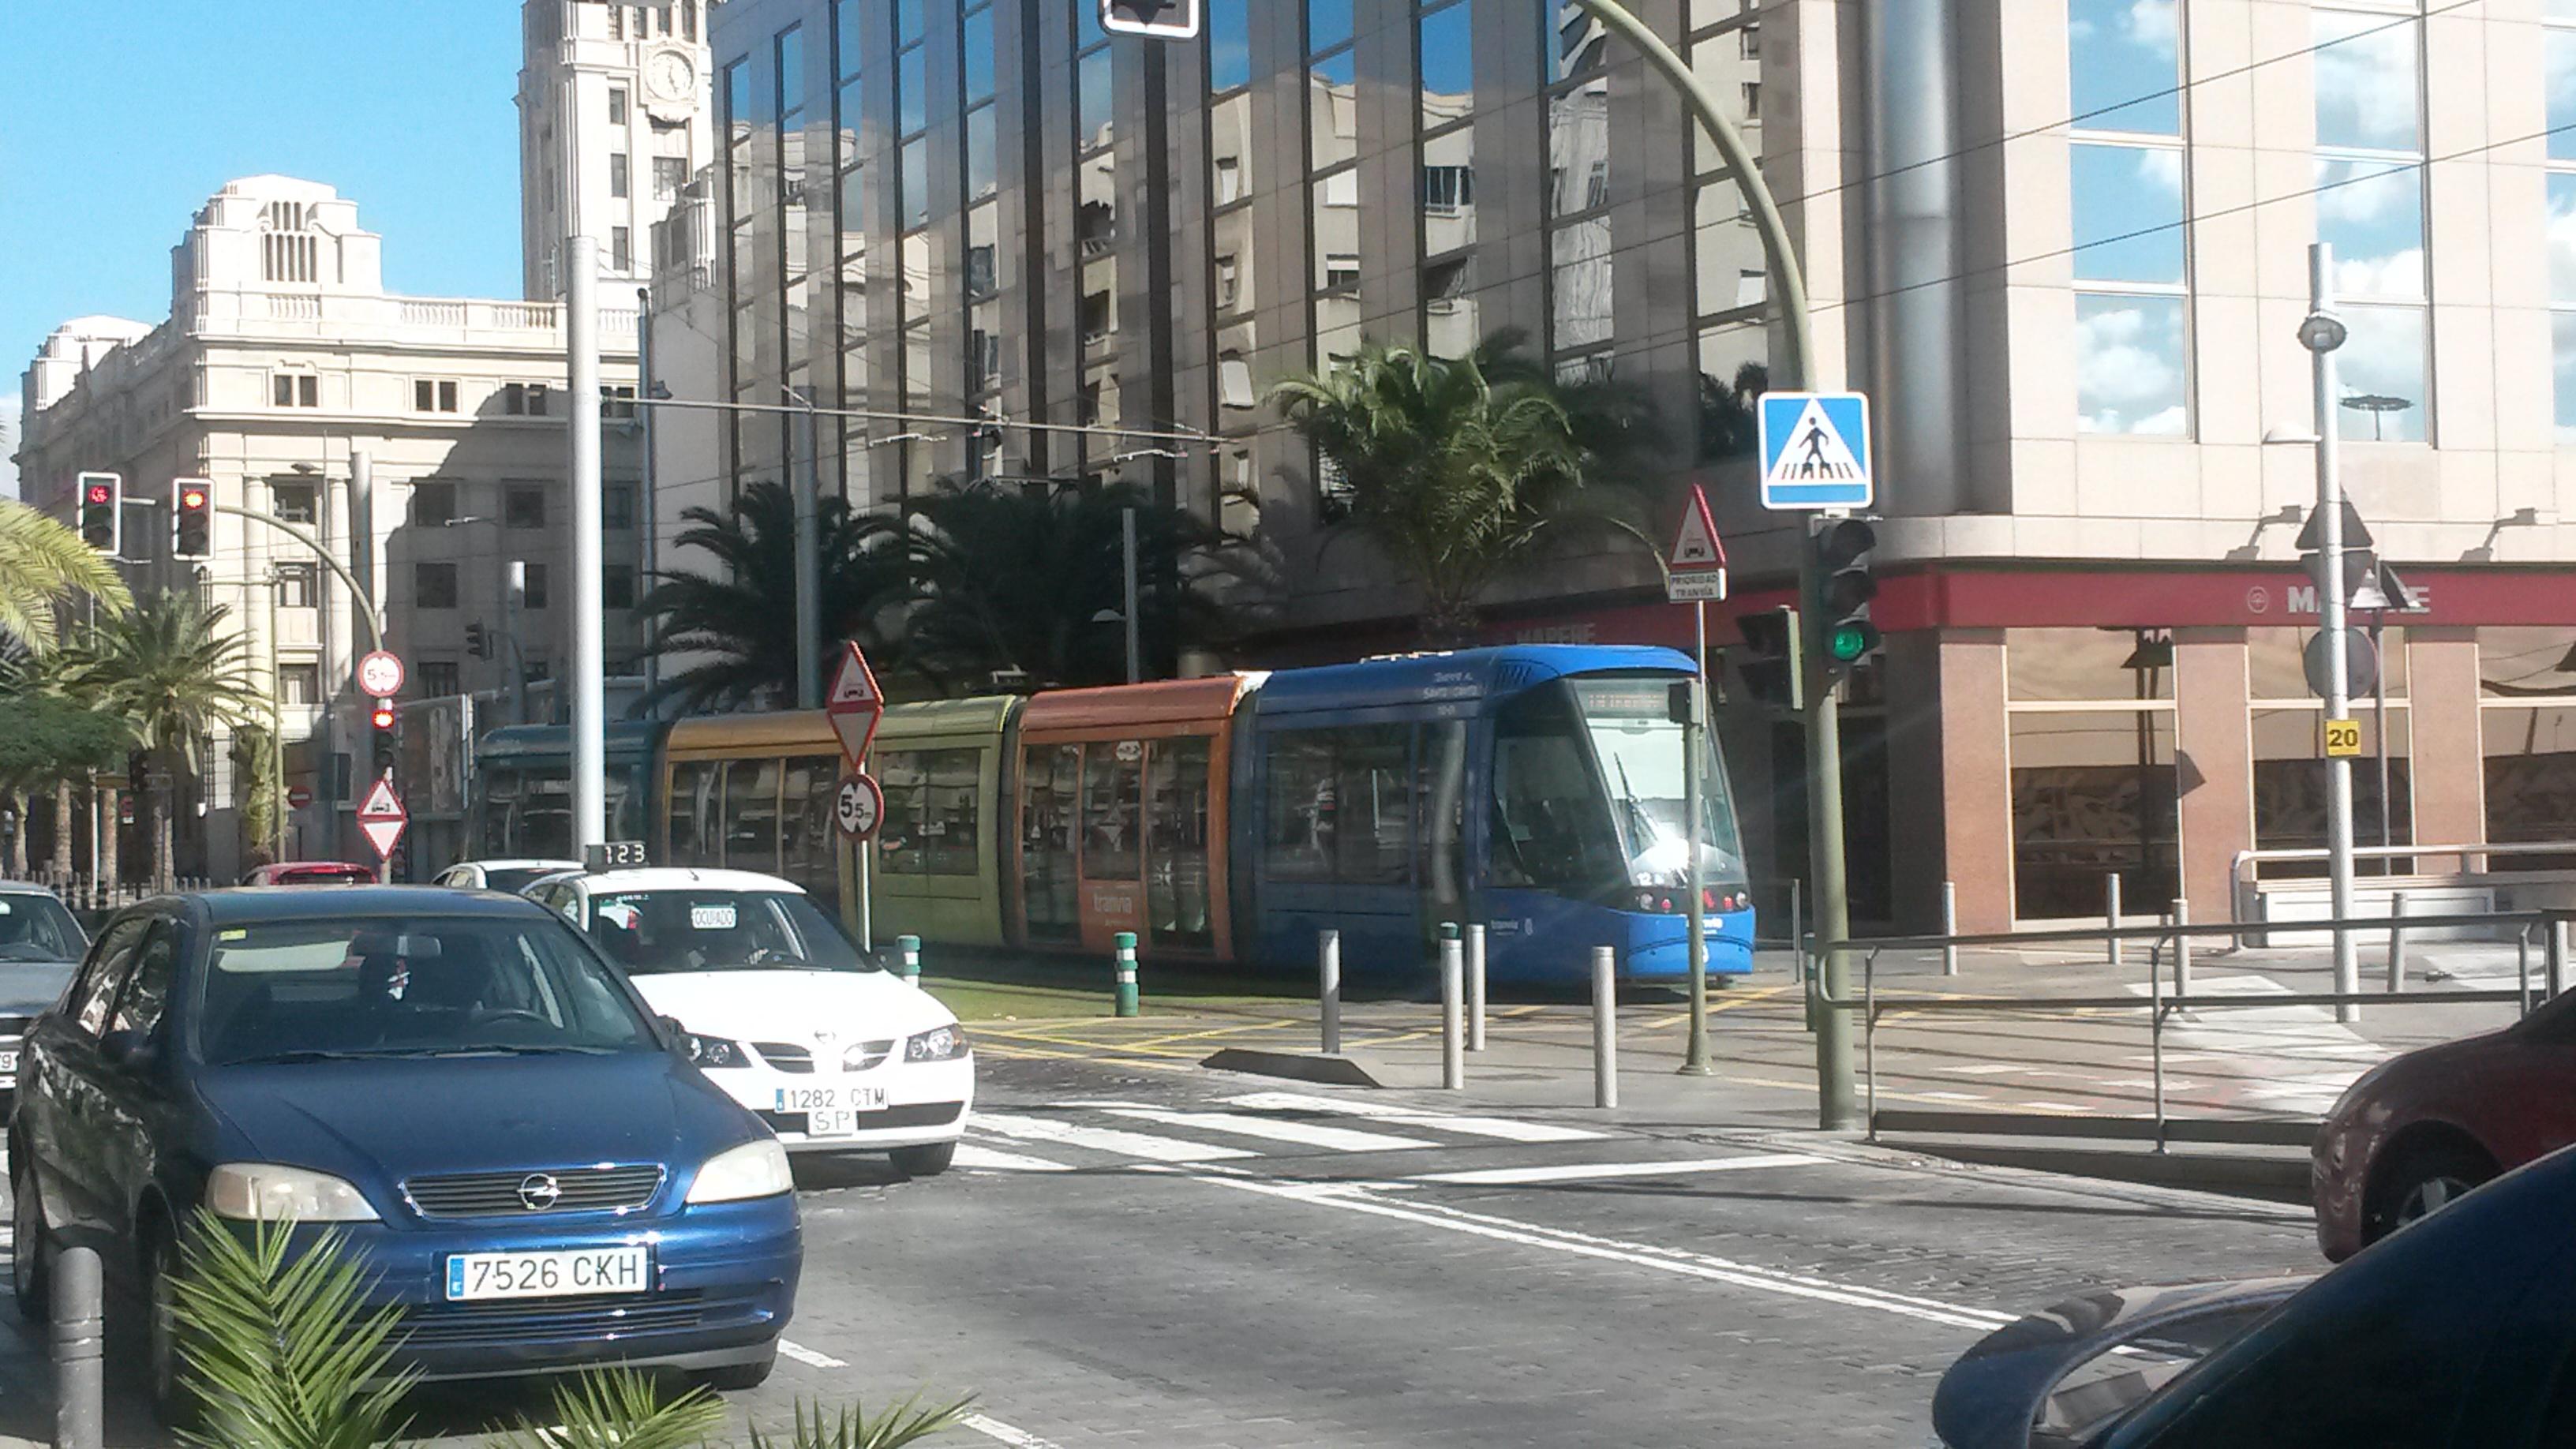 20131218_122751